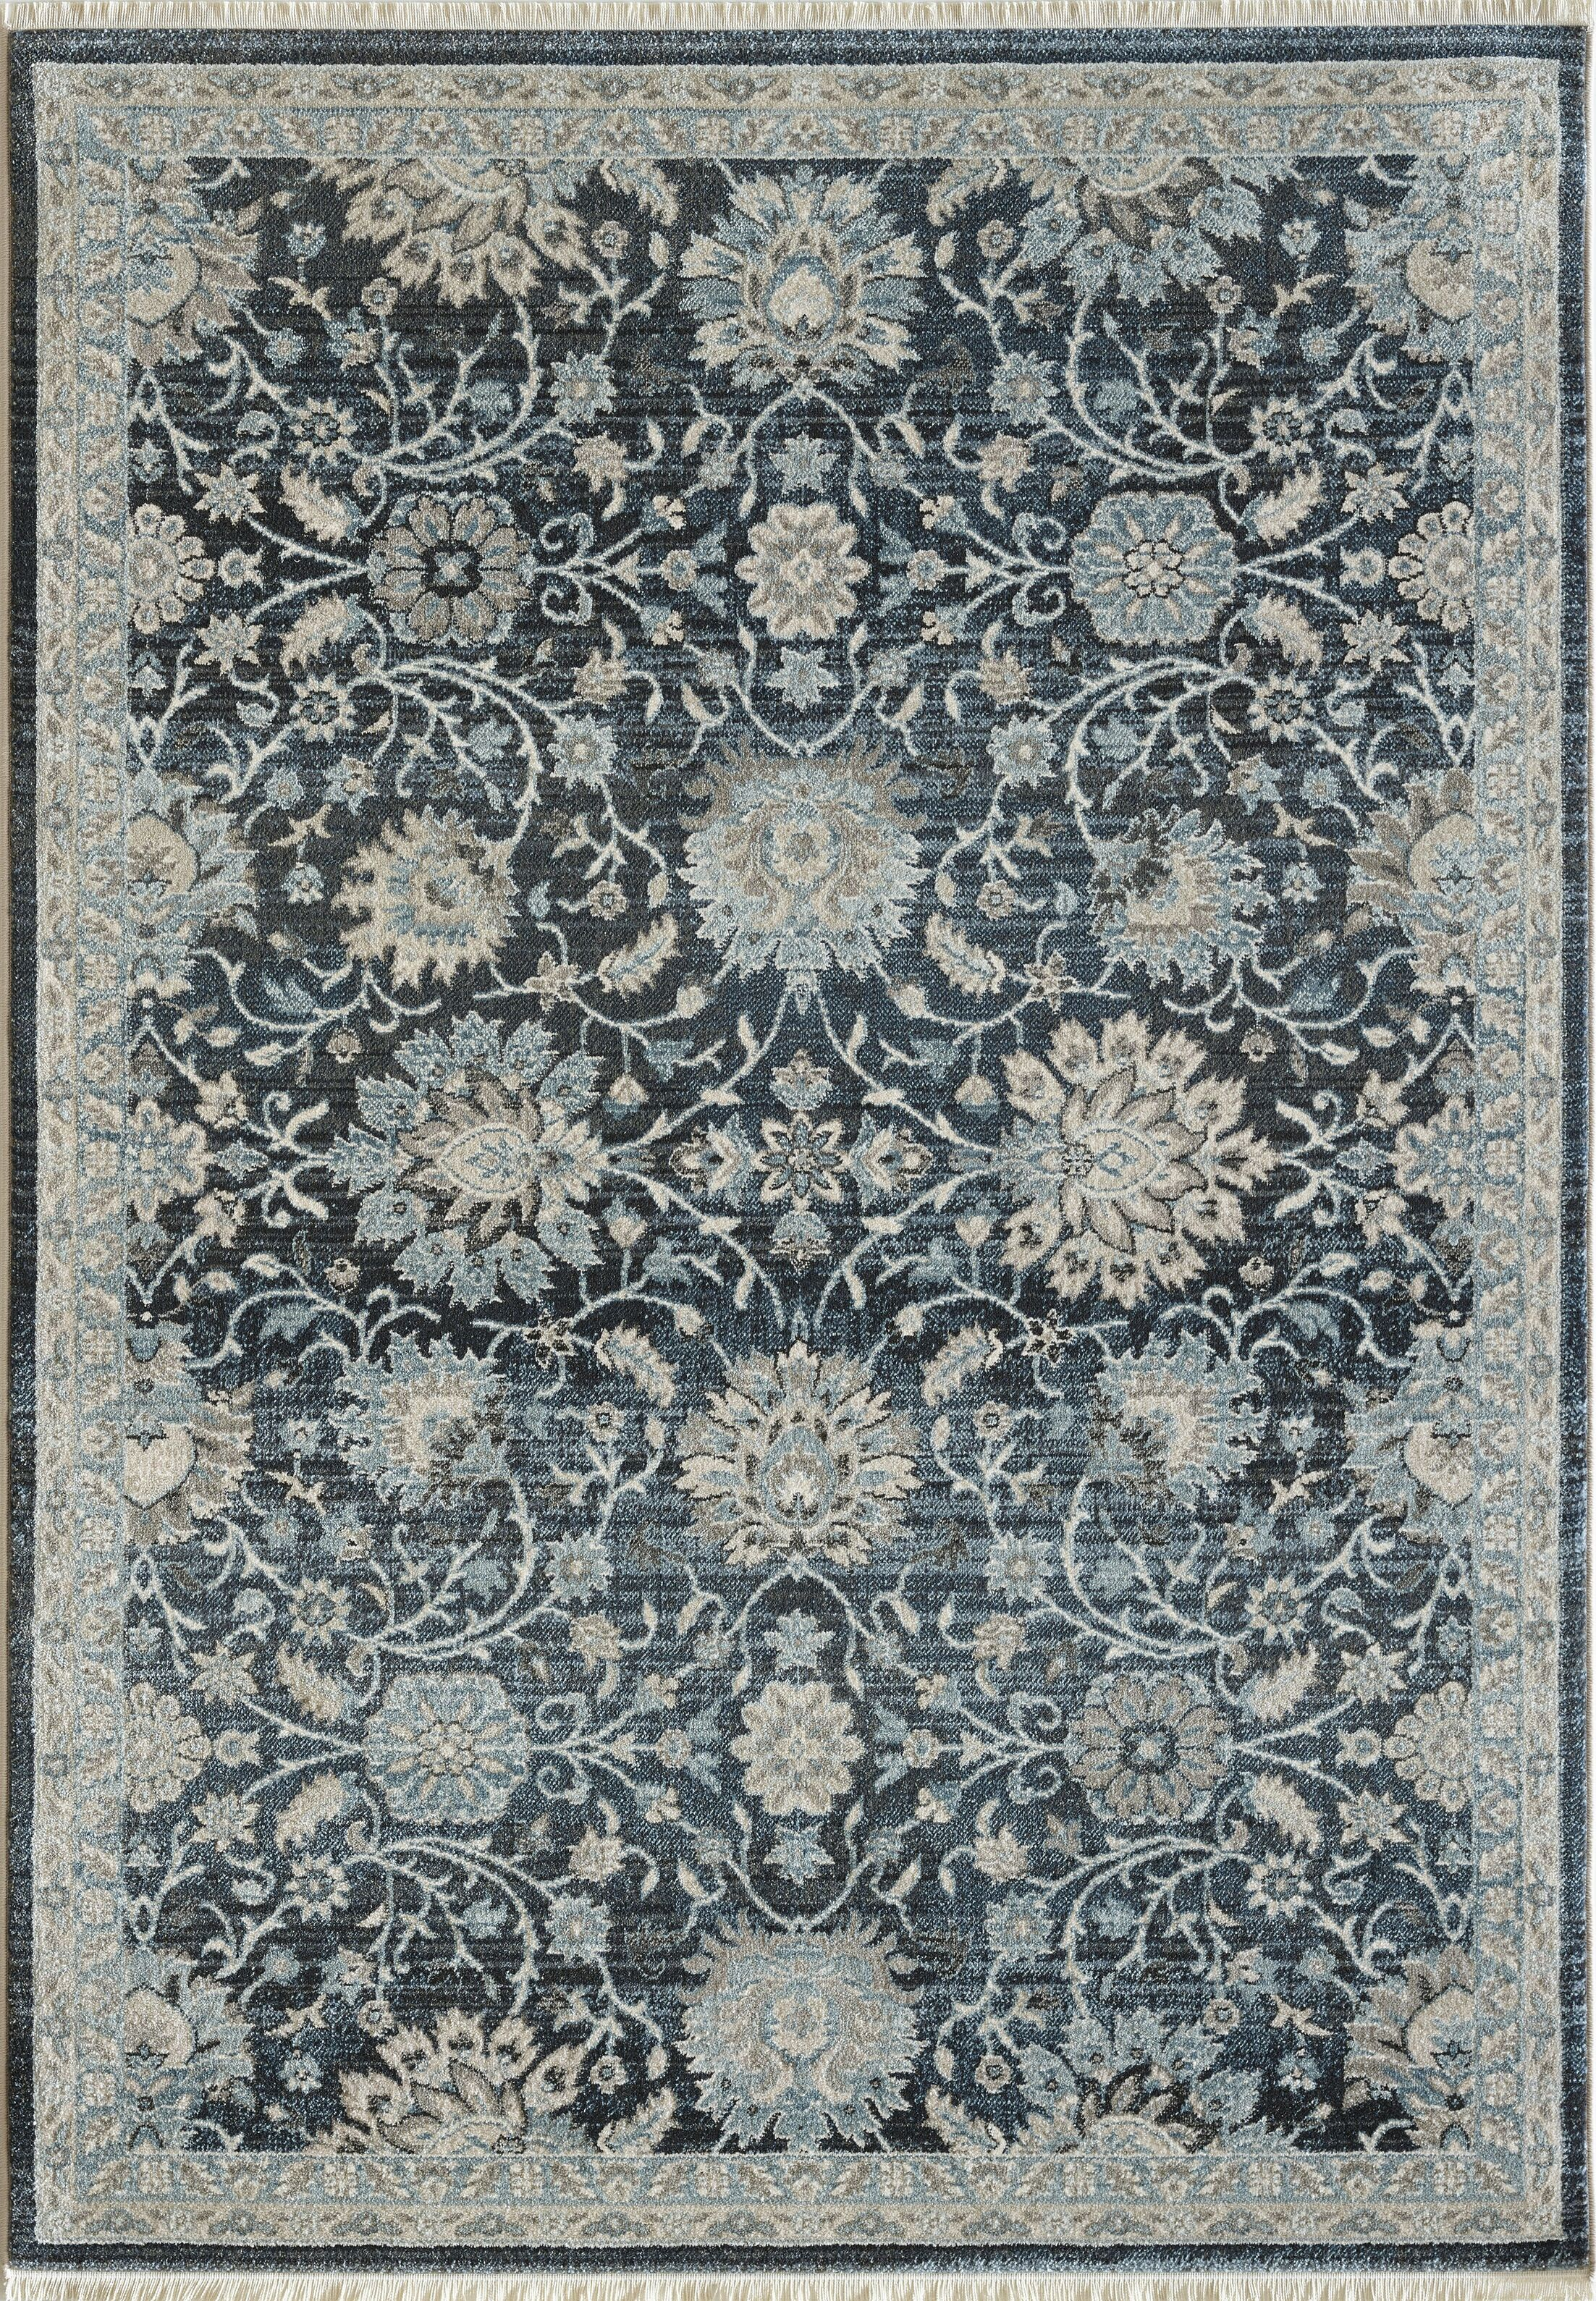 Omarion Blue Area Rug Rug Size: Rectangle 6'7